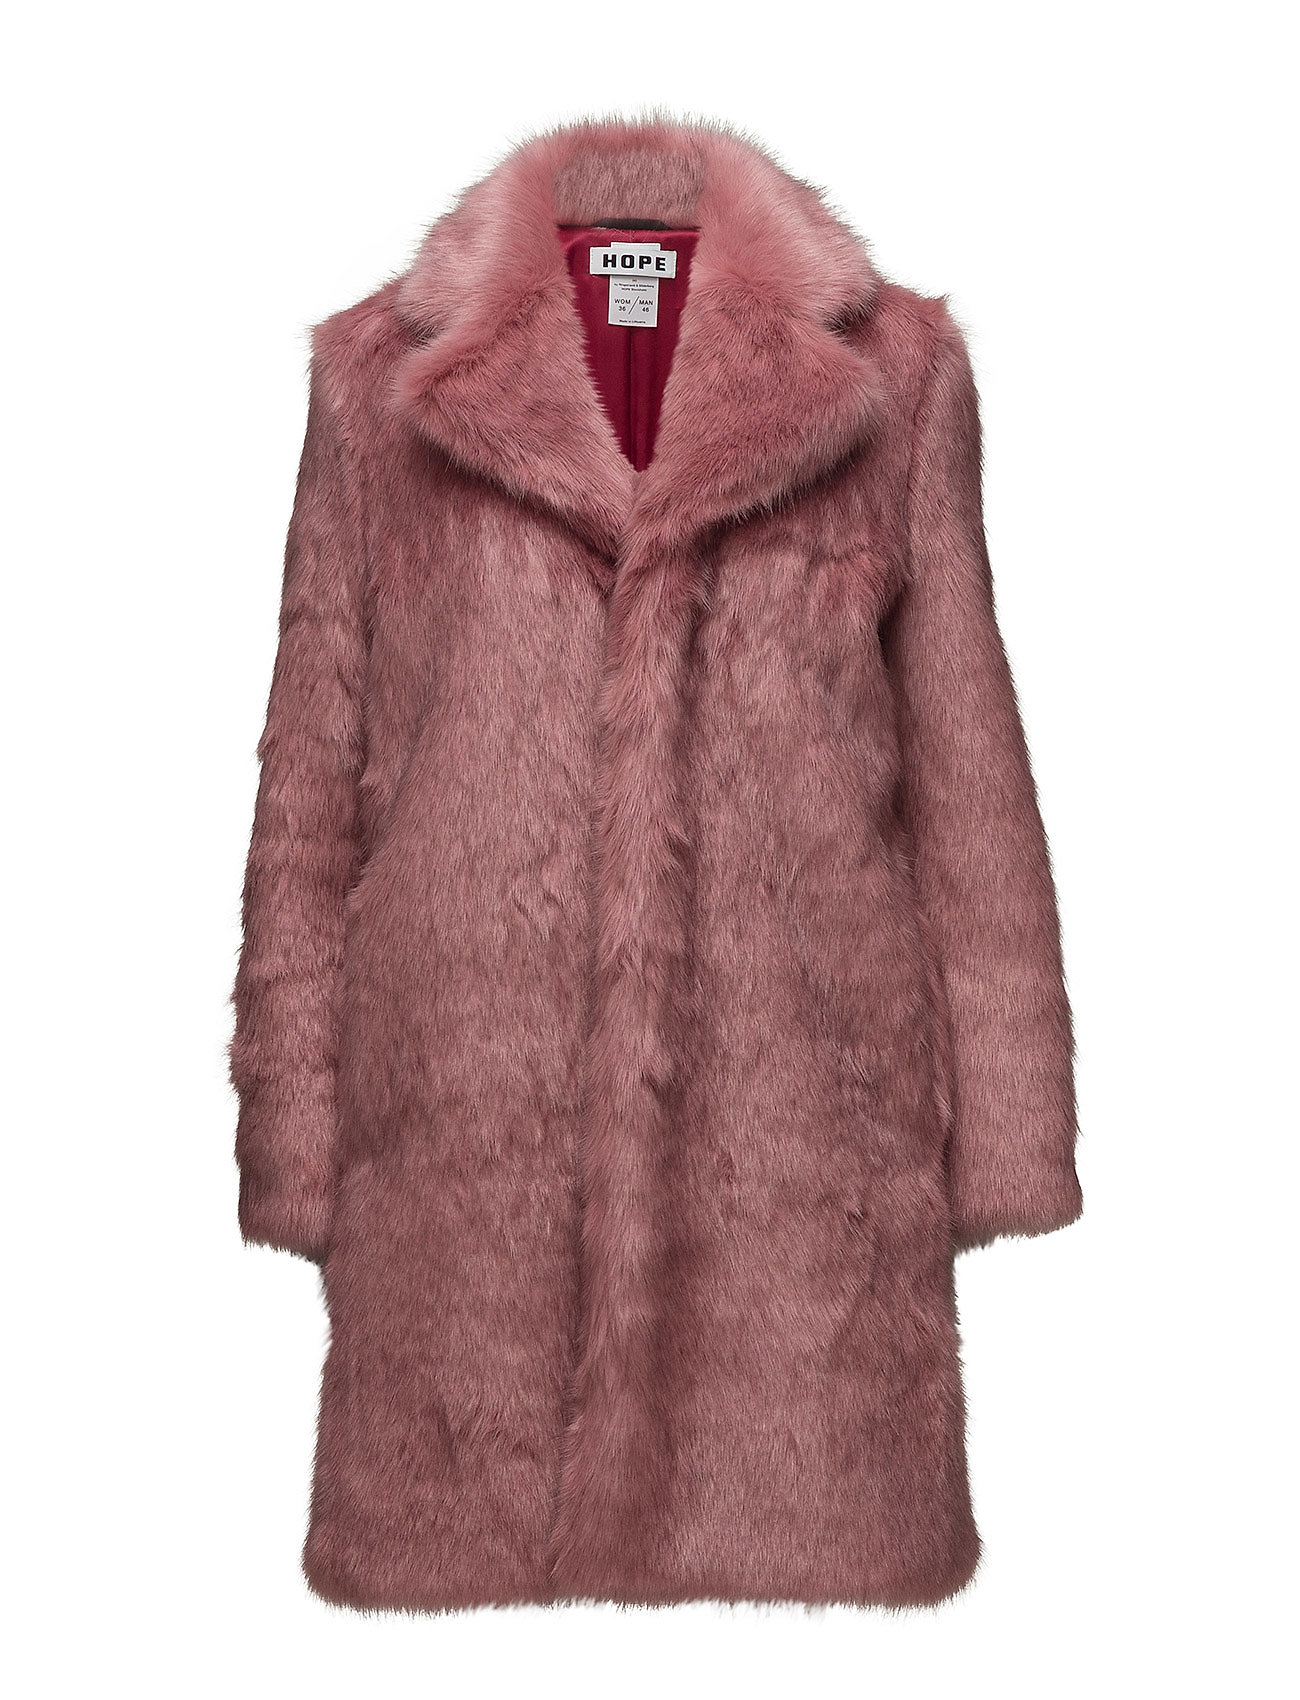 Hope Foxy Coat